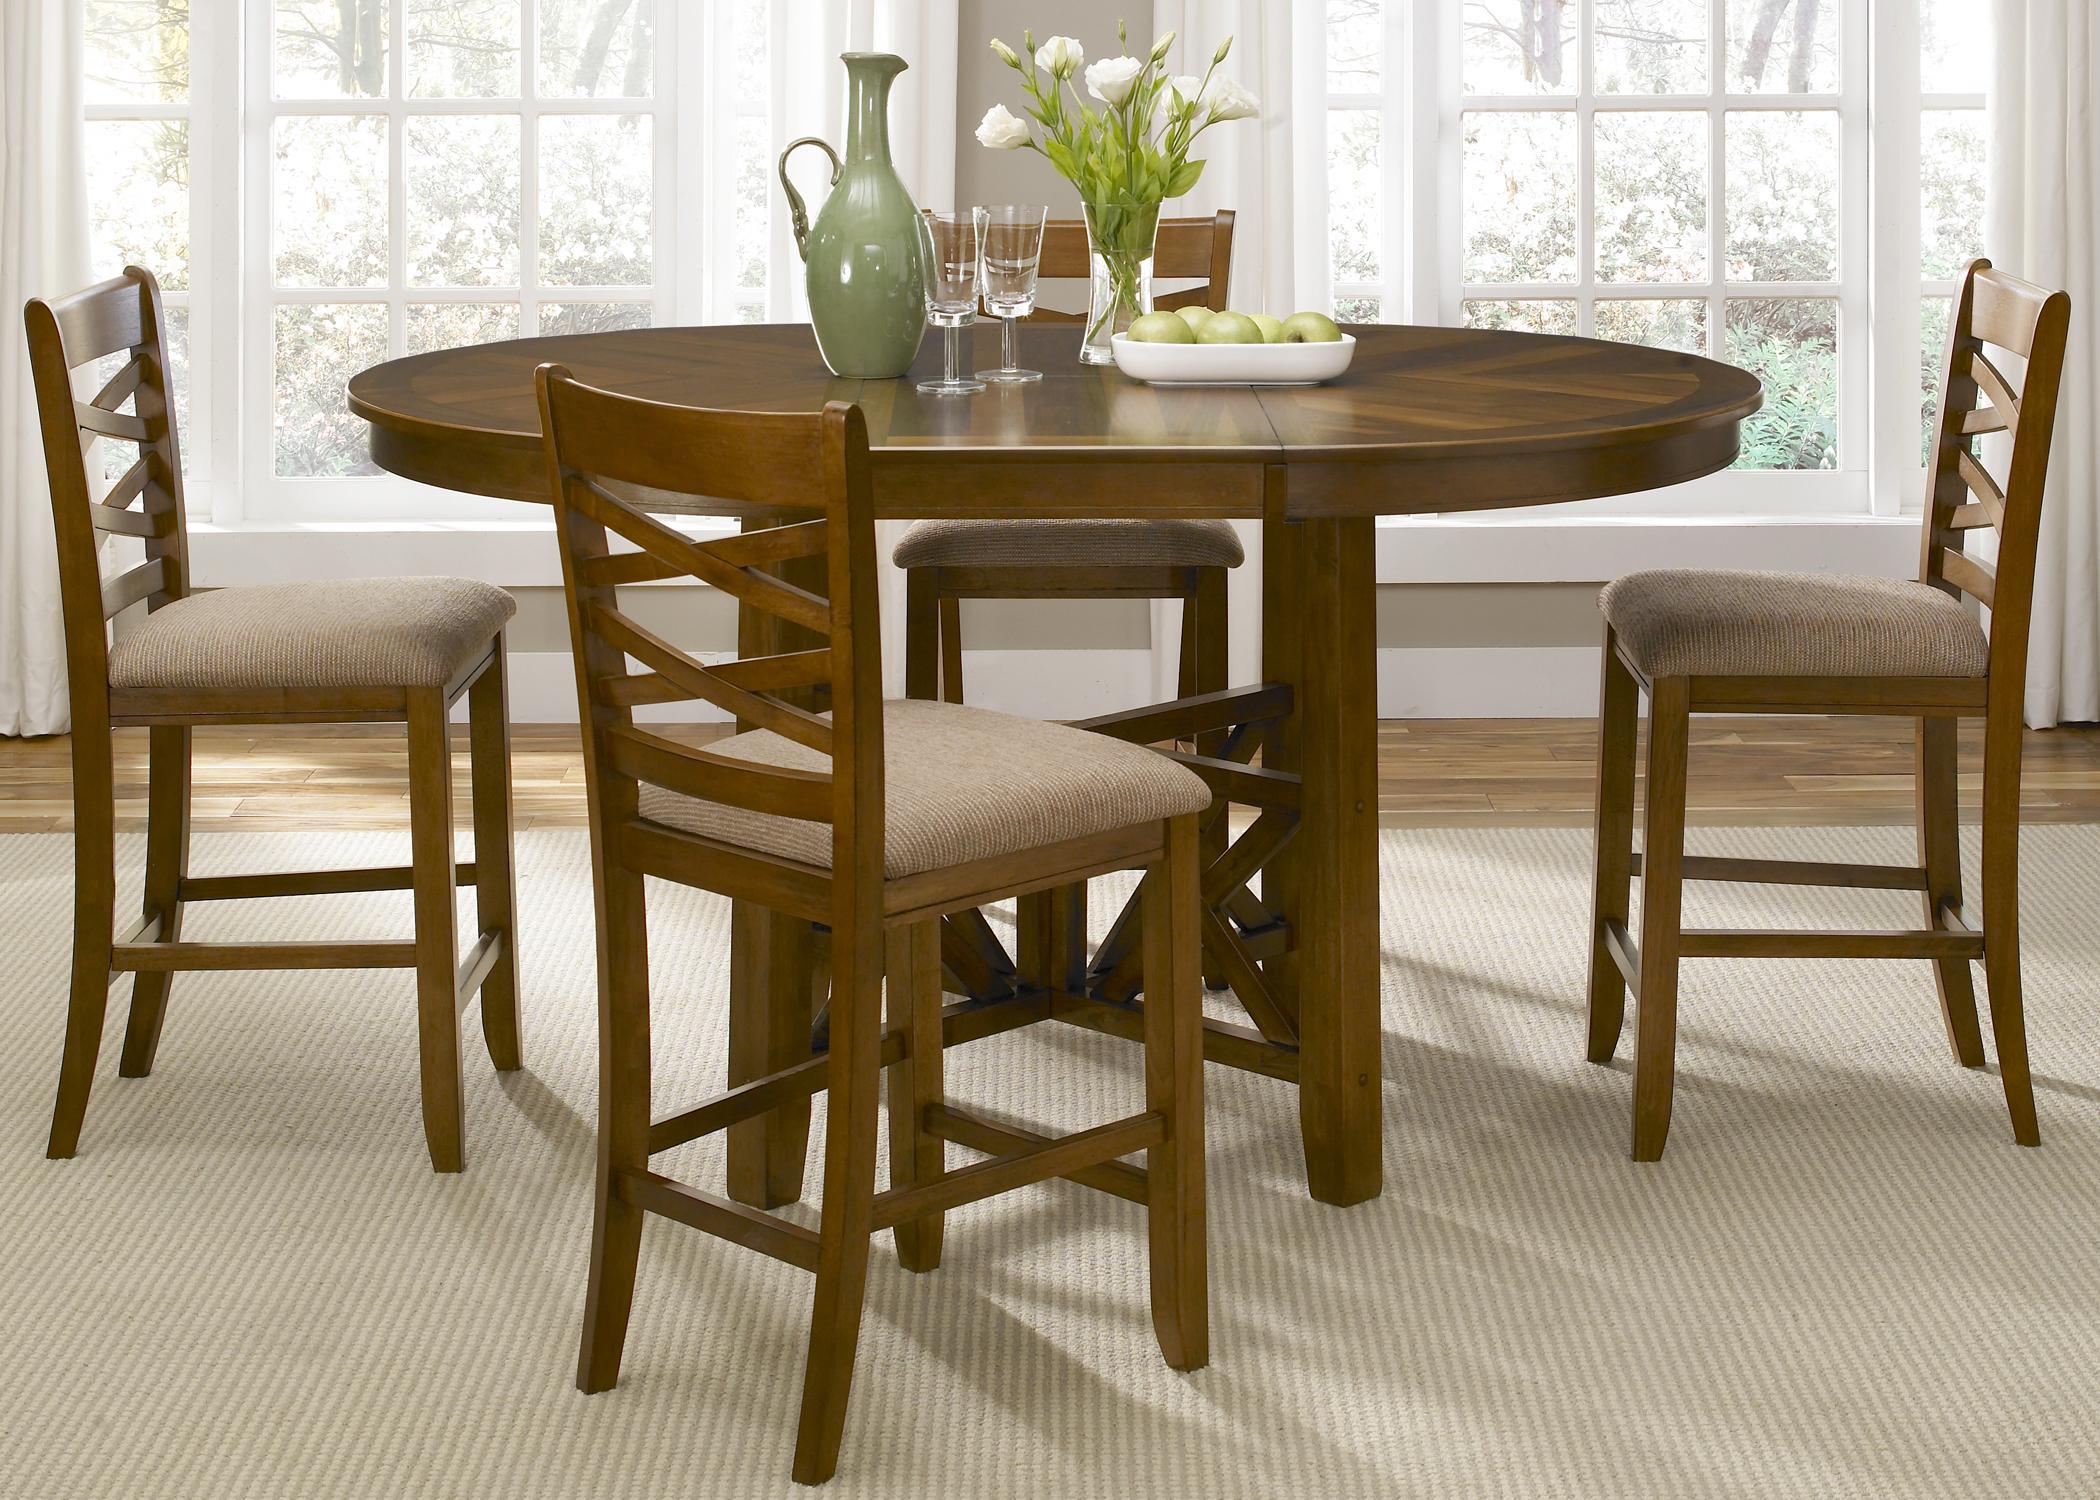 Liberty Furniture Applewood 5 Piece Gathering Height Dining Set - Item Number: 64-CD-SET14